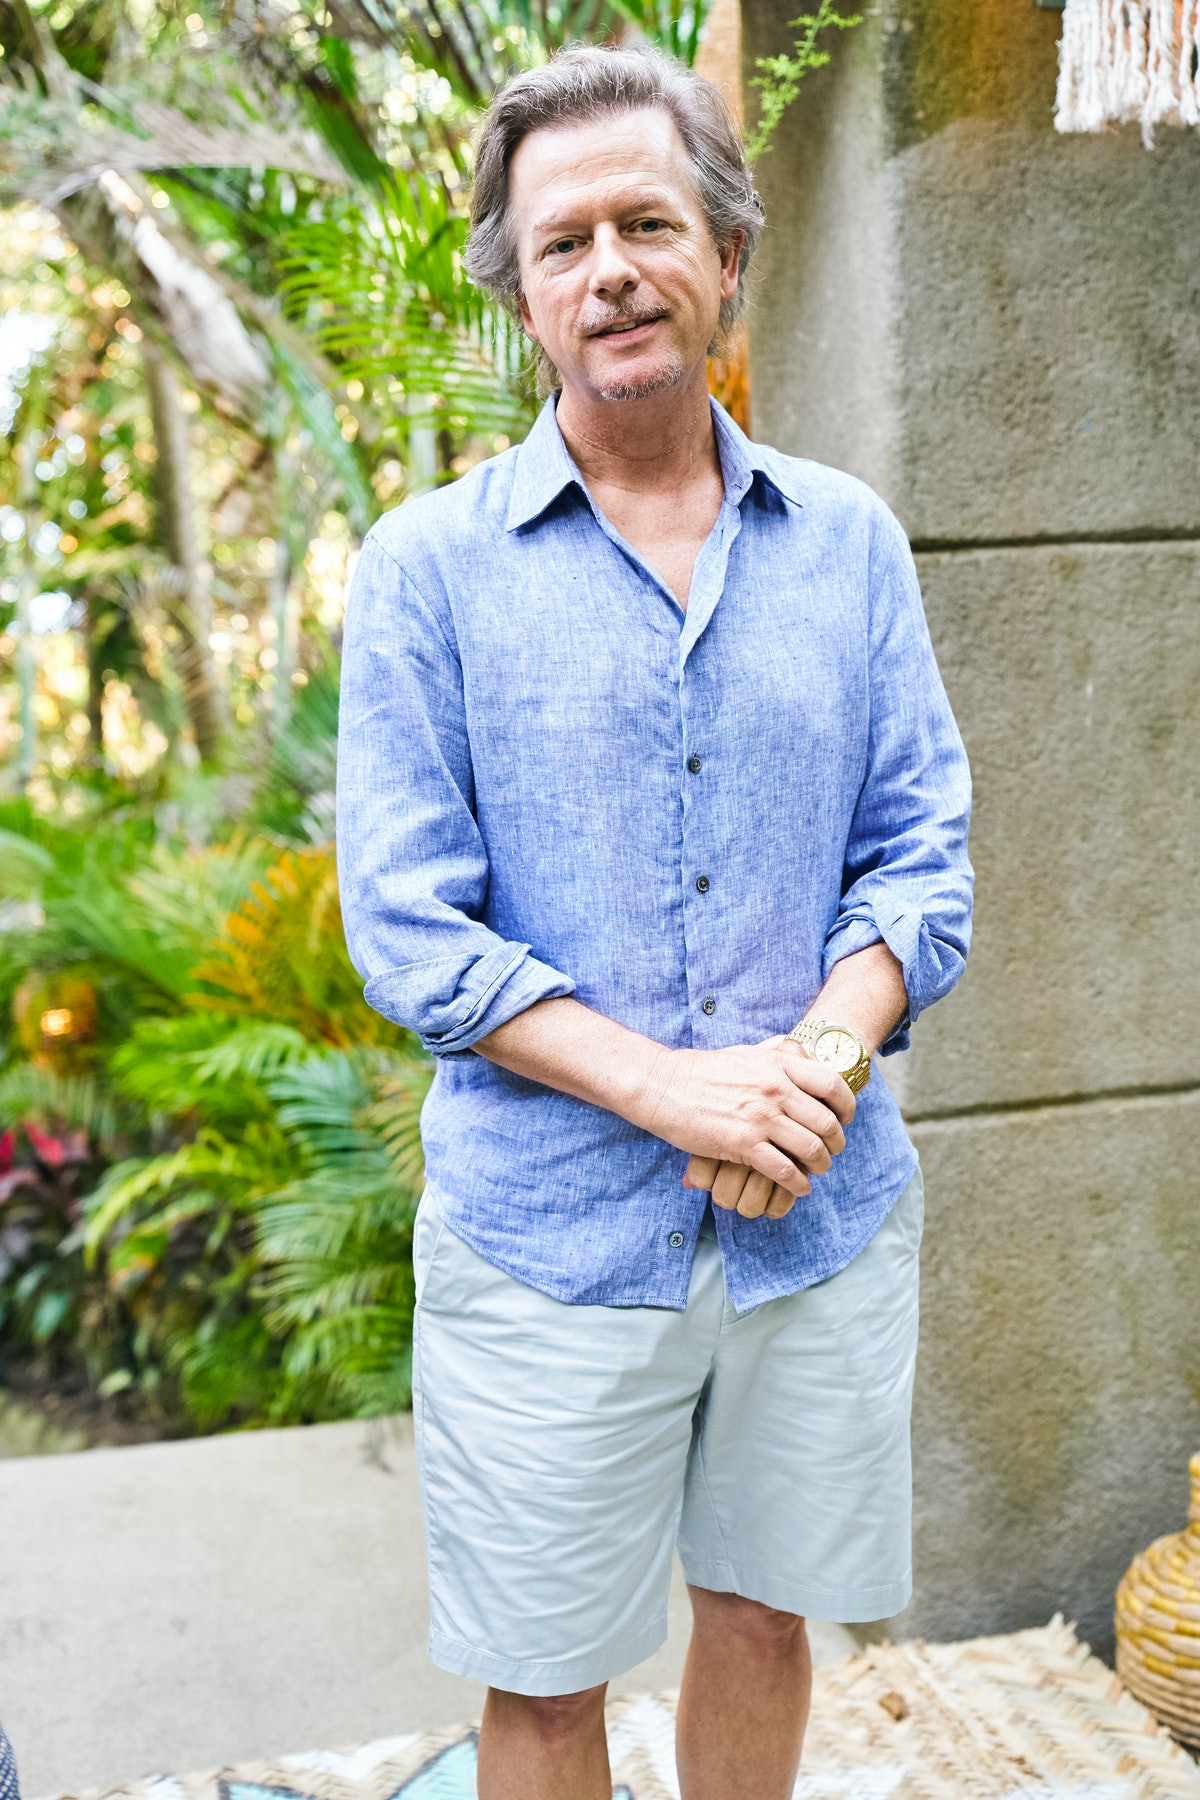 David Spade hosting Season 7 of ABC's 'Bachelor in Paradise'